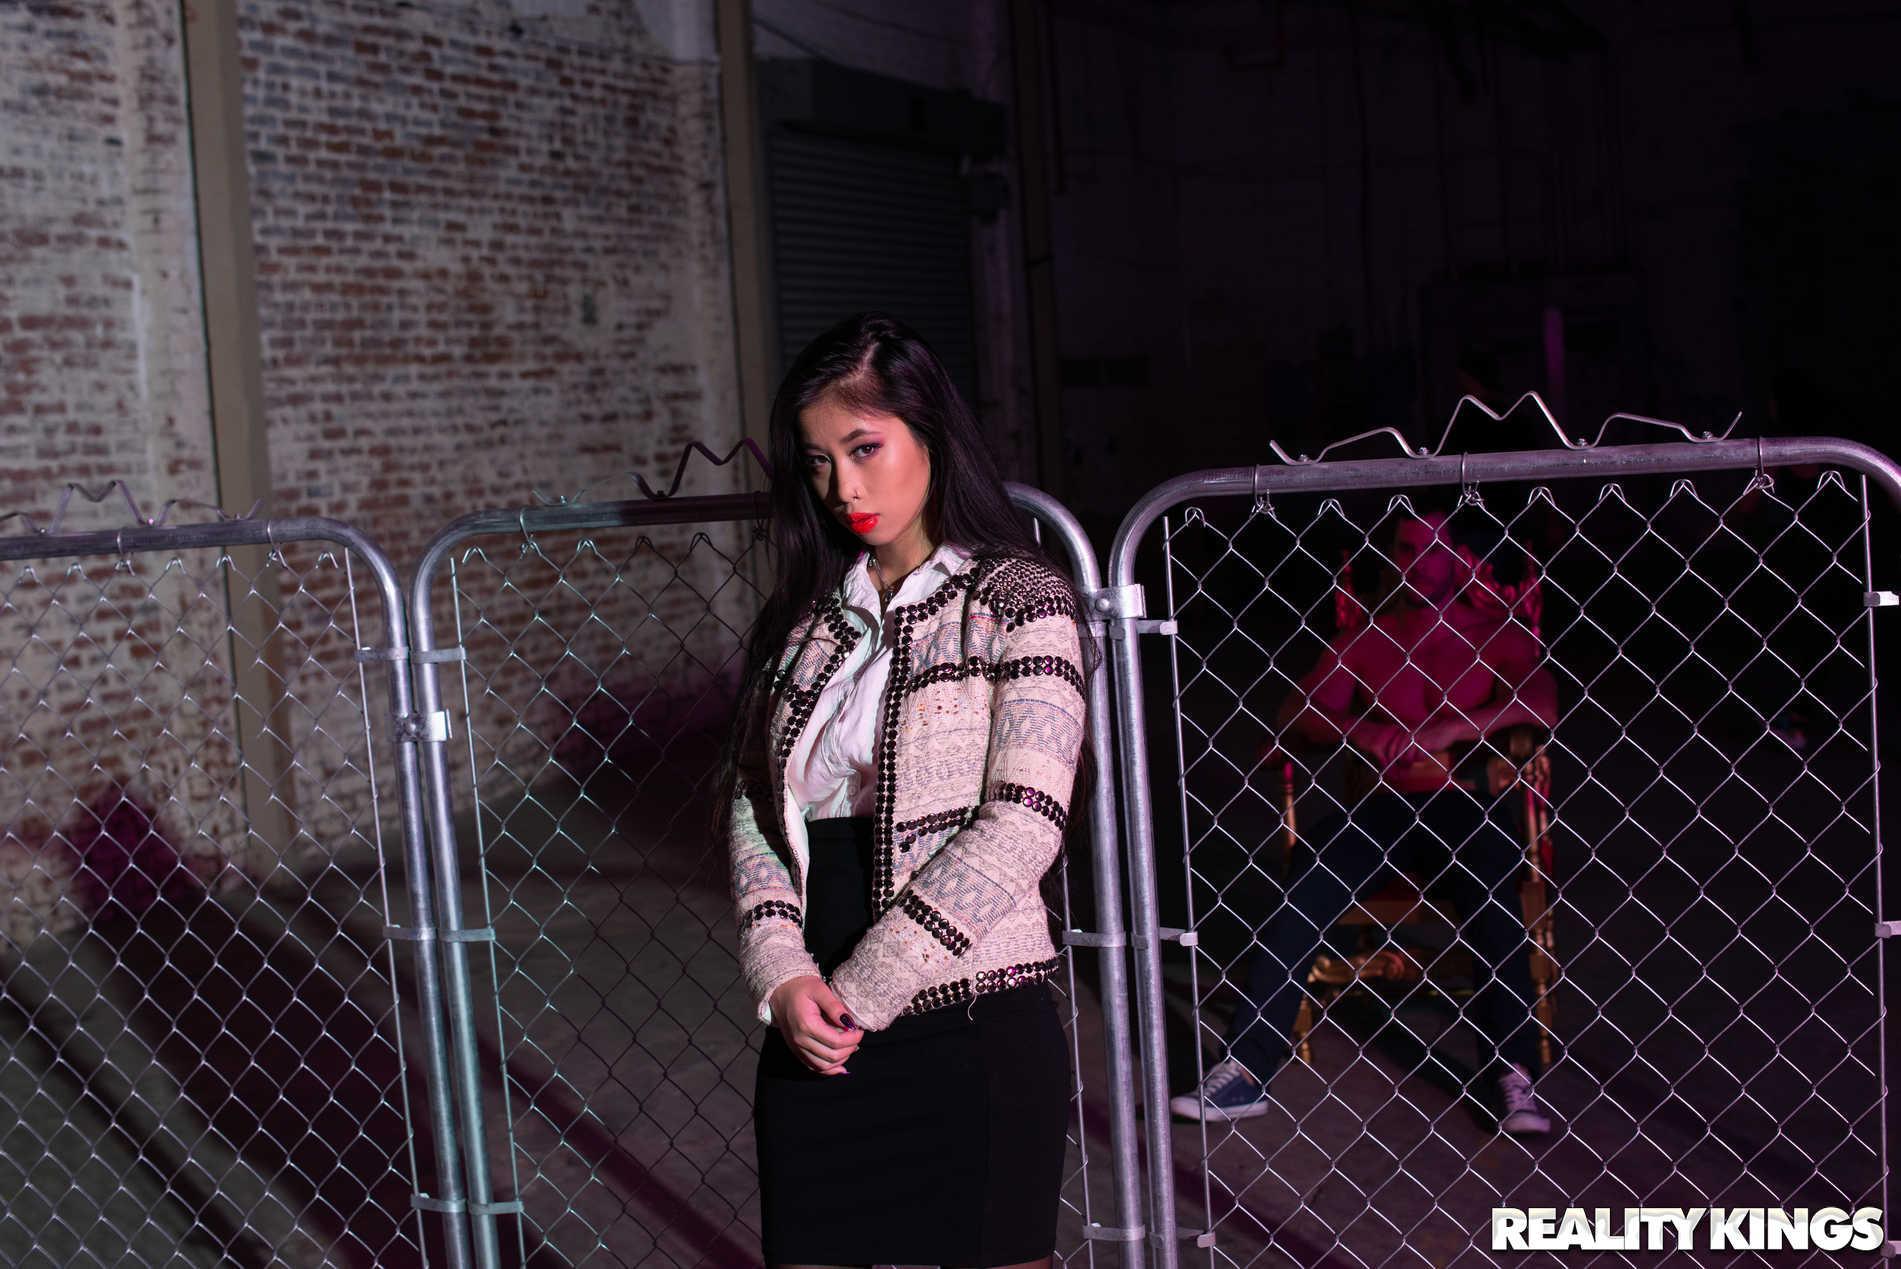 Reality Kings 'Chainlink Tease' starring Jade Kush (Photo 1)